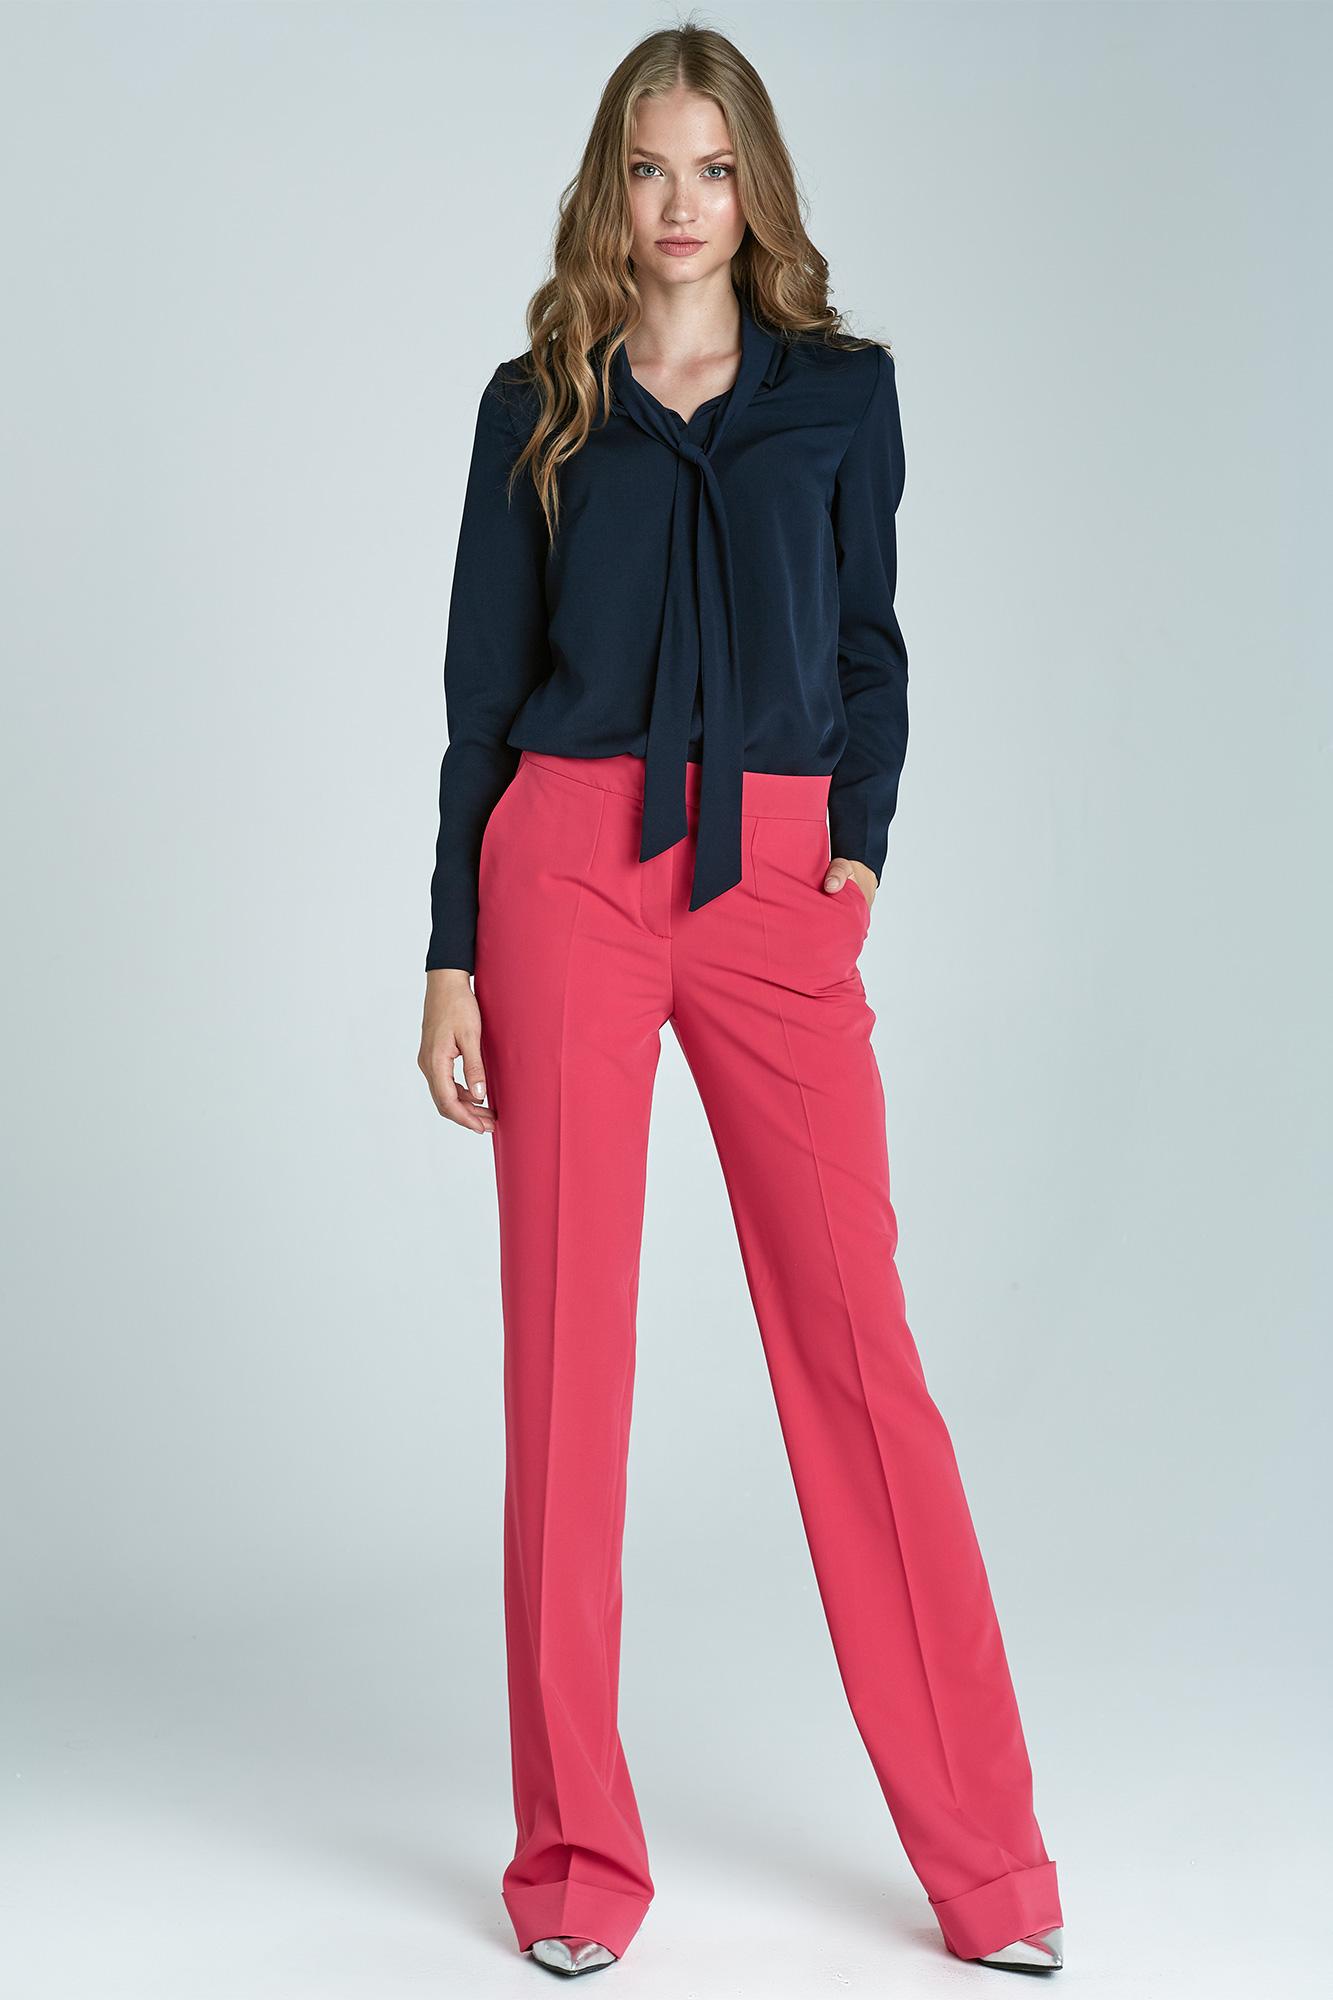 ec7b33f79643 Acheter un pantalon tailleur chic